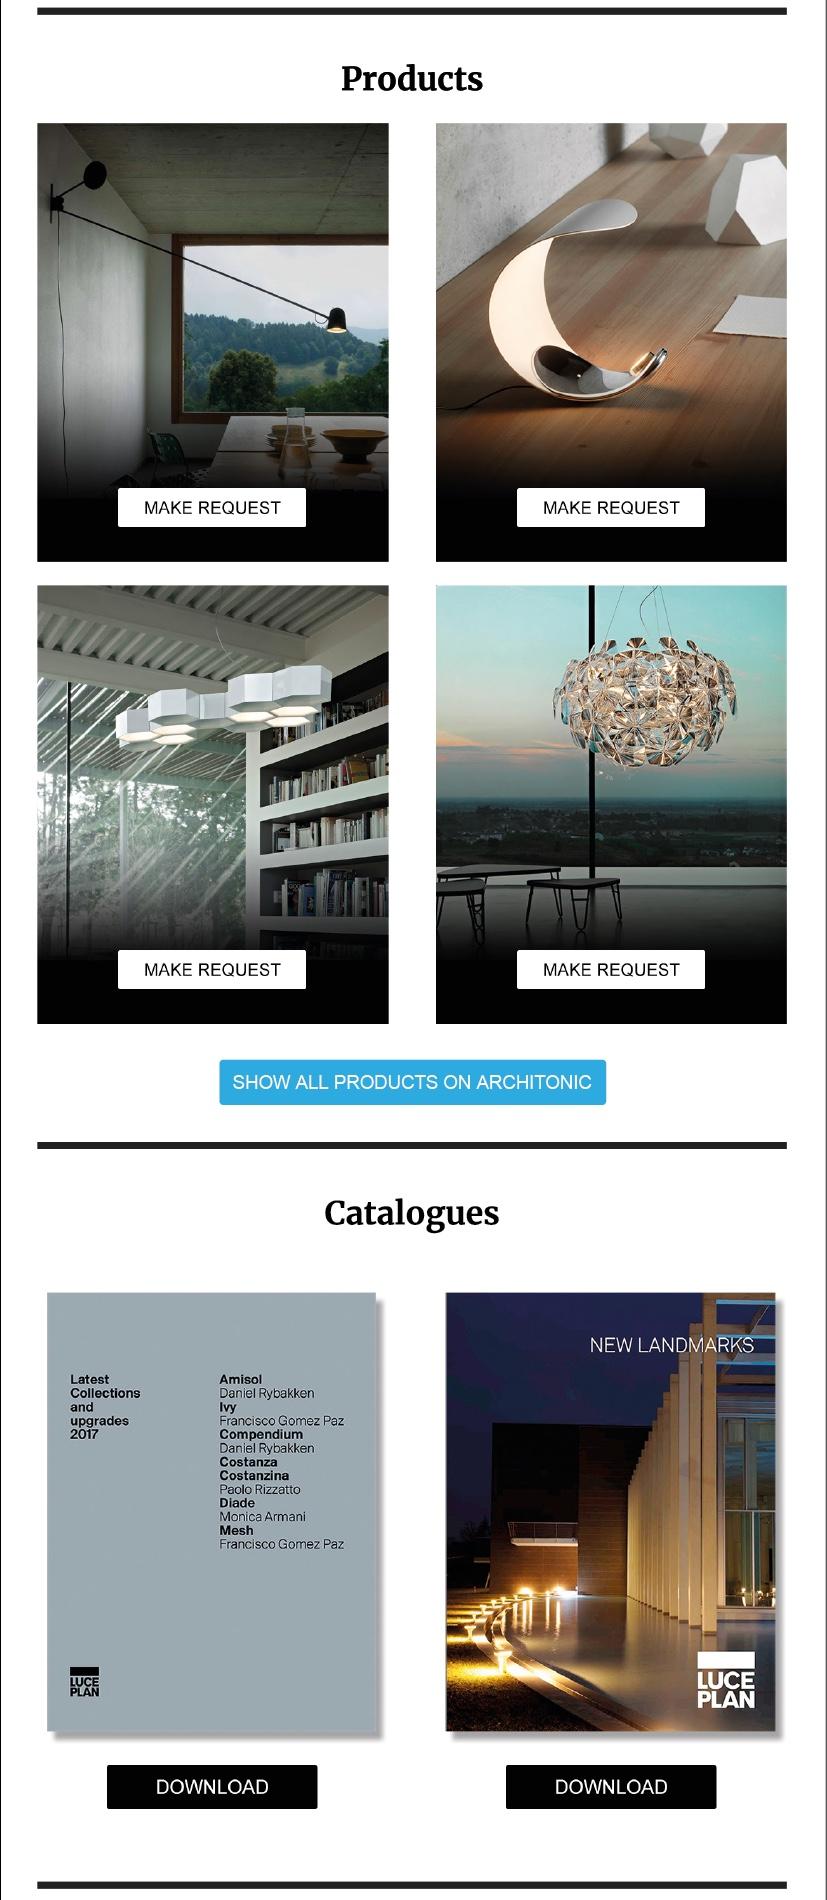 brand-essentials_03_products.jpg